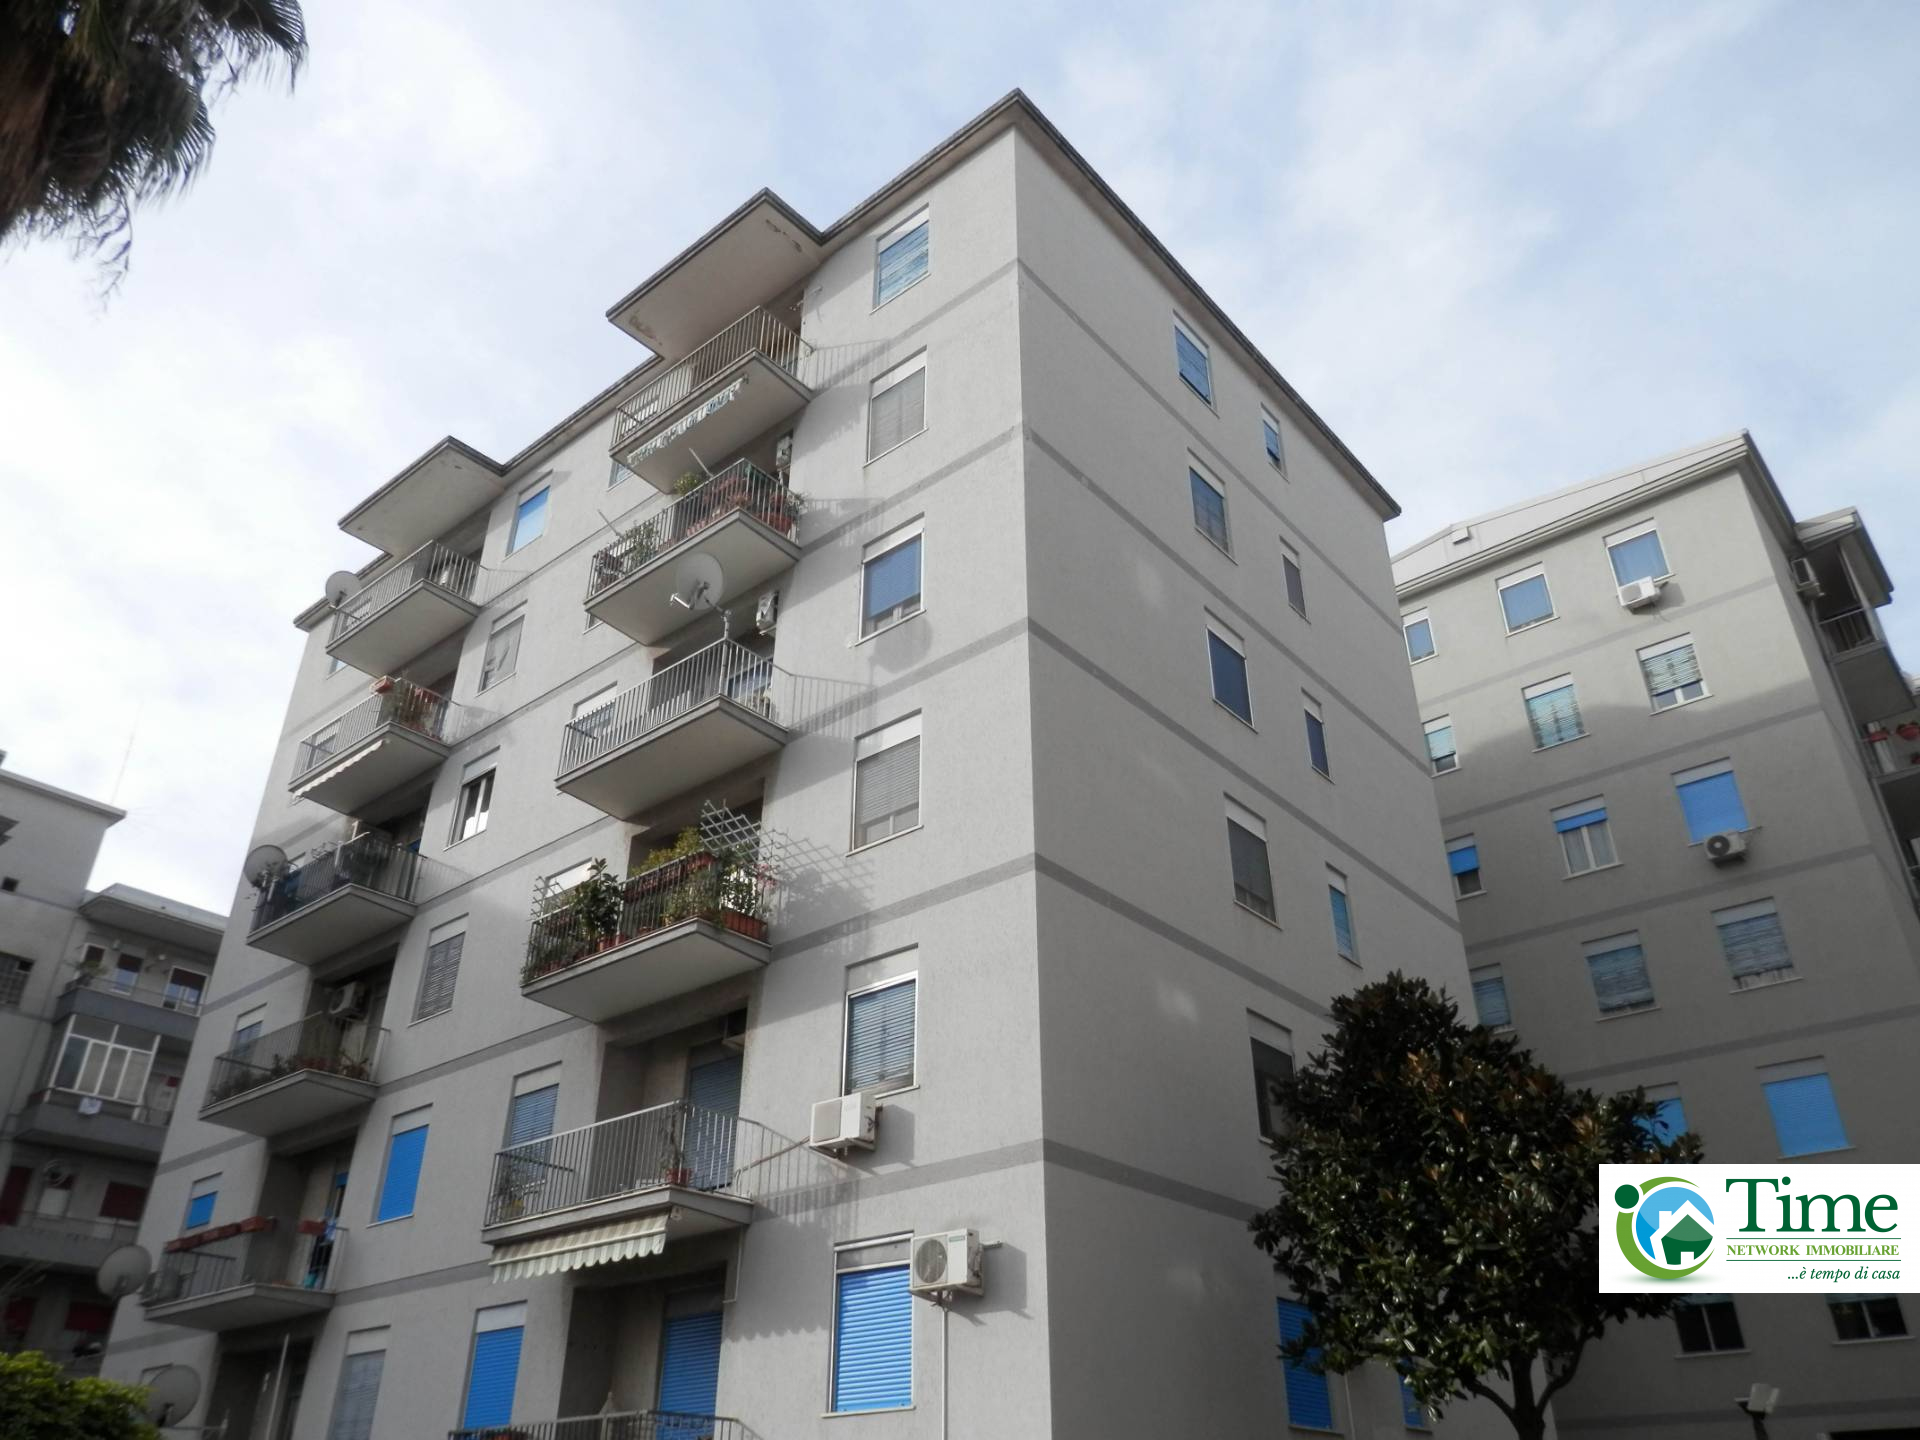 catania vendita quart: viale a. fleming time network immobiliare - agenzia gravina